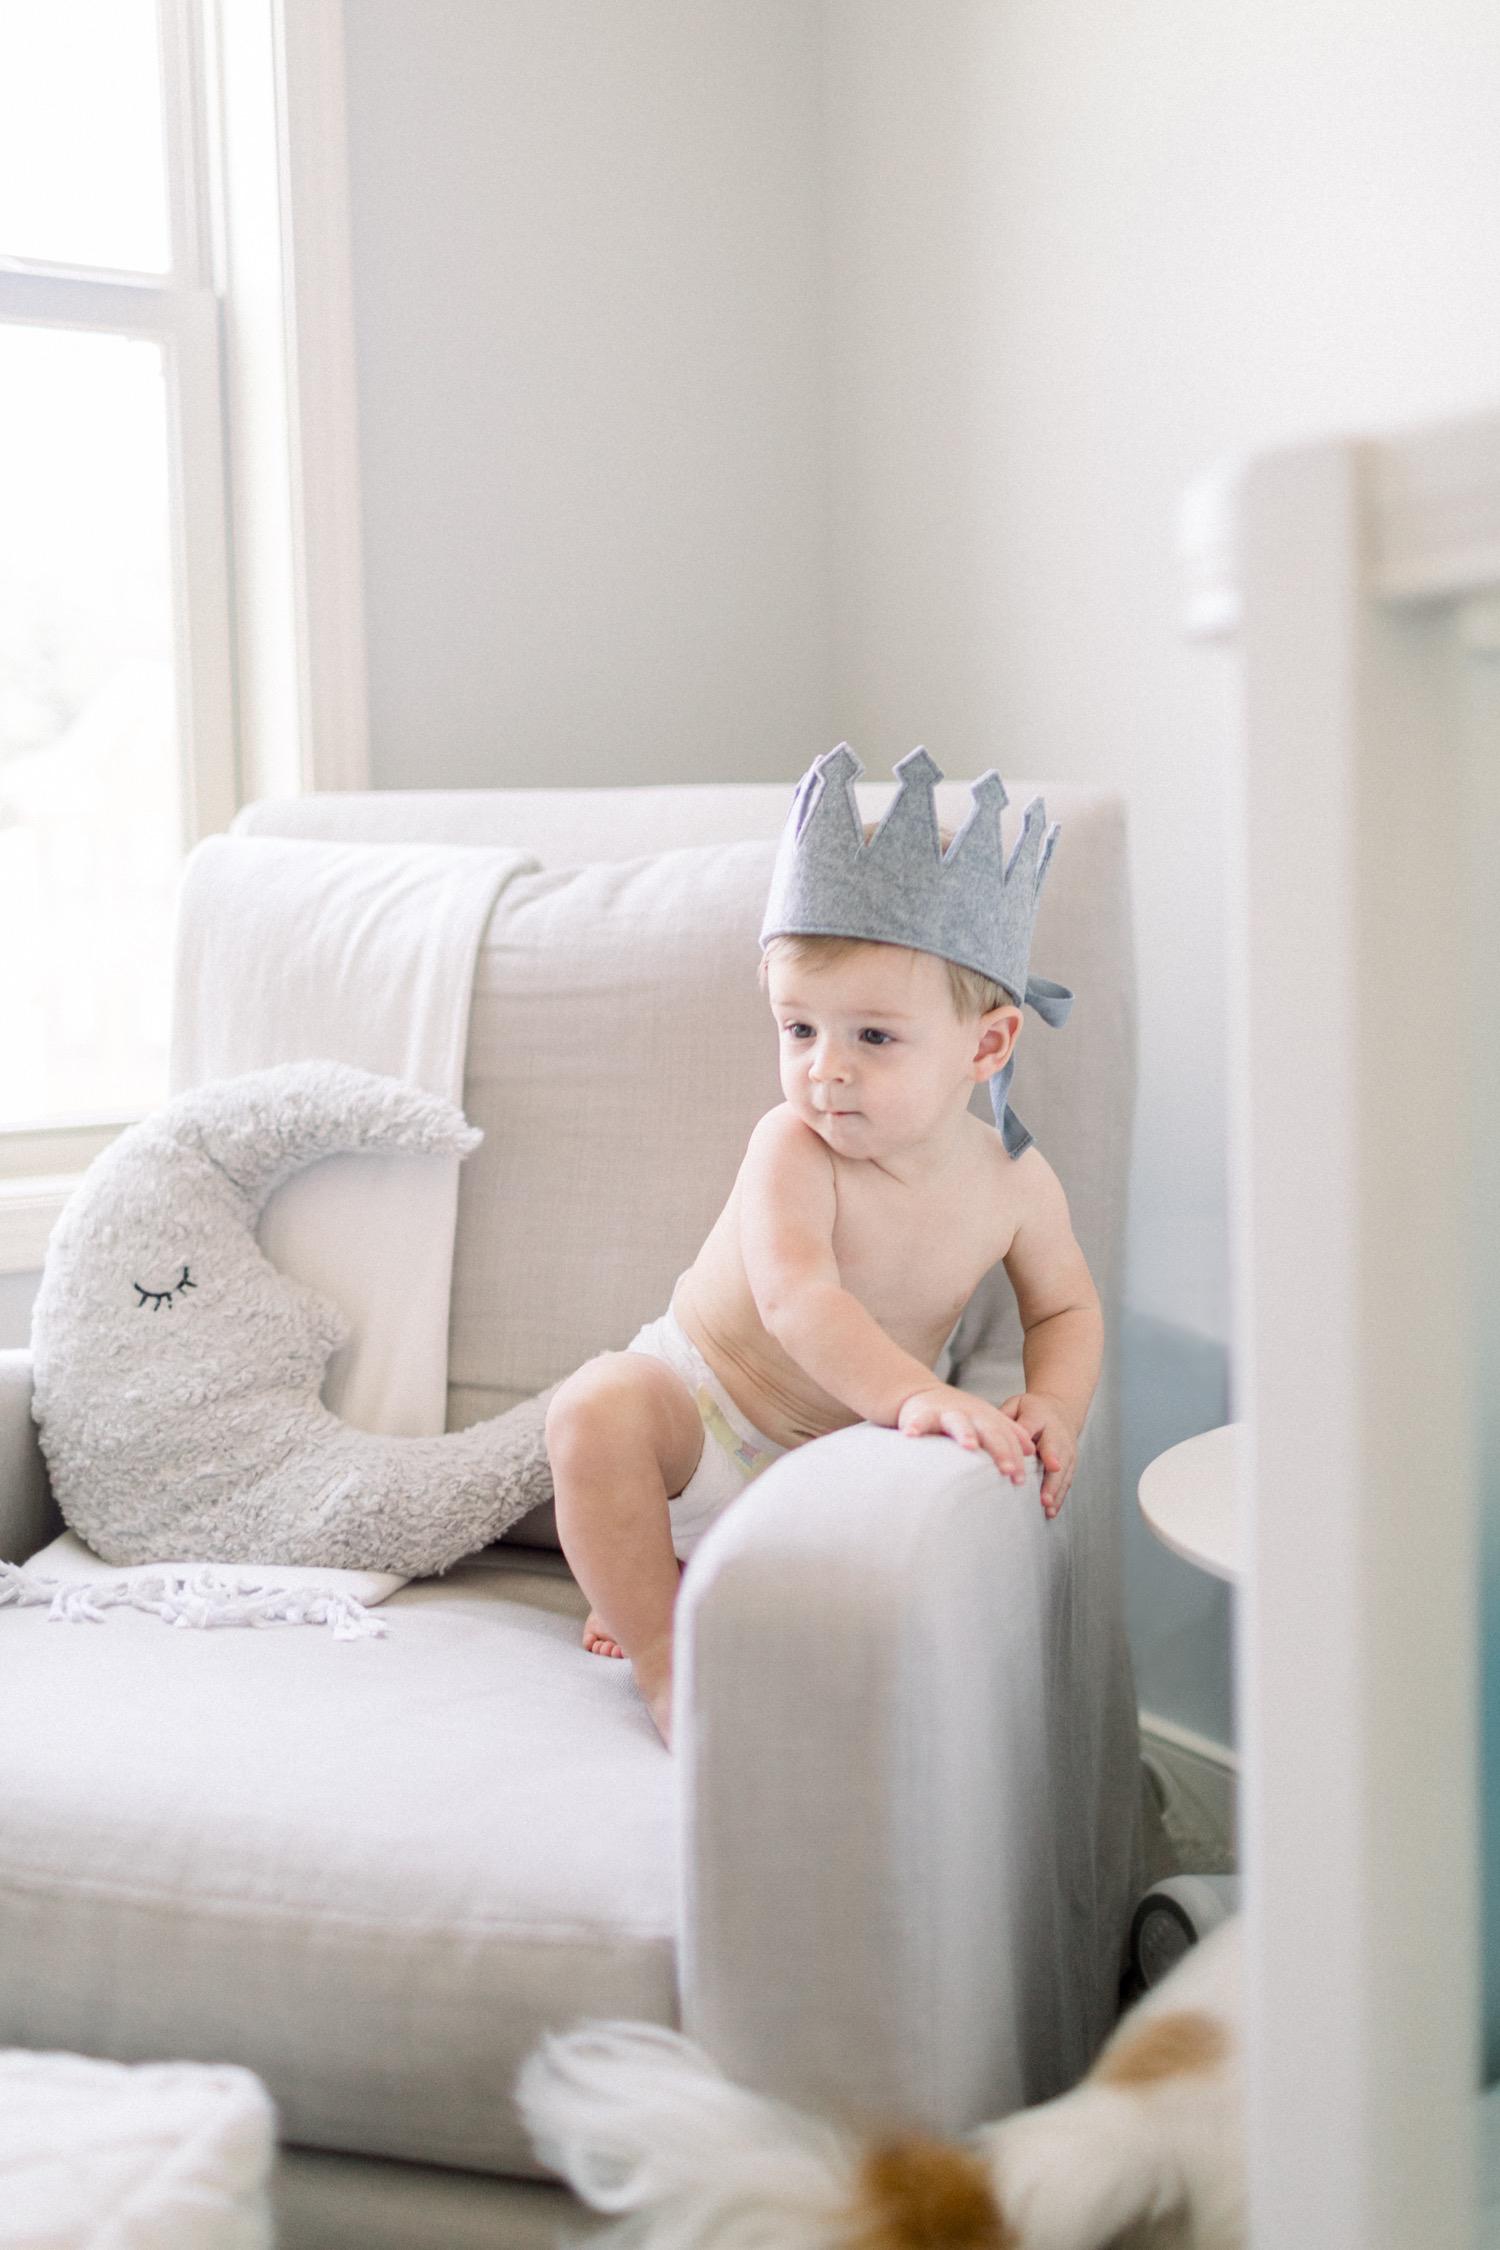 180805-0031-baby-boy-at-home-session-washington-dc-elisenda-llinares.jpg